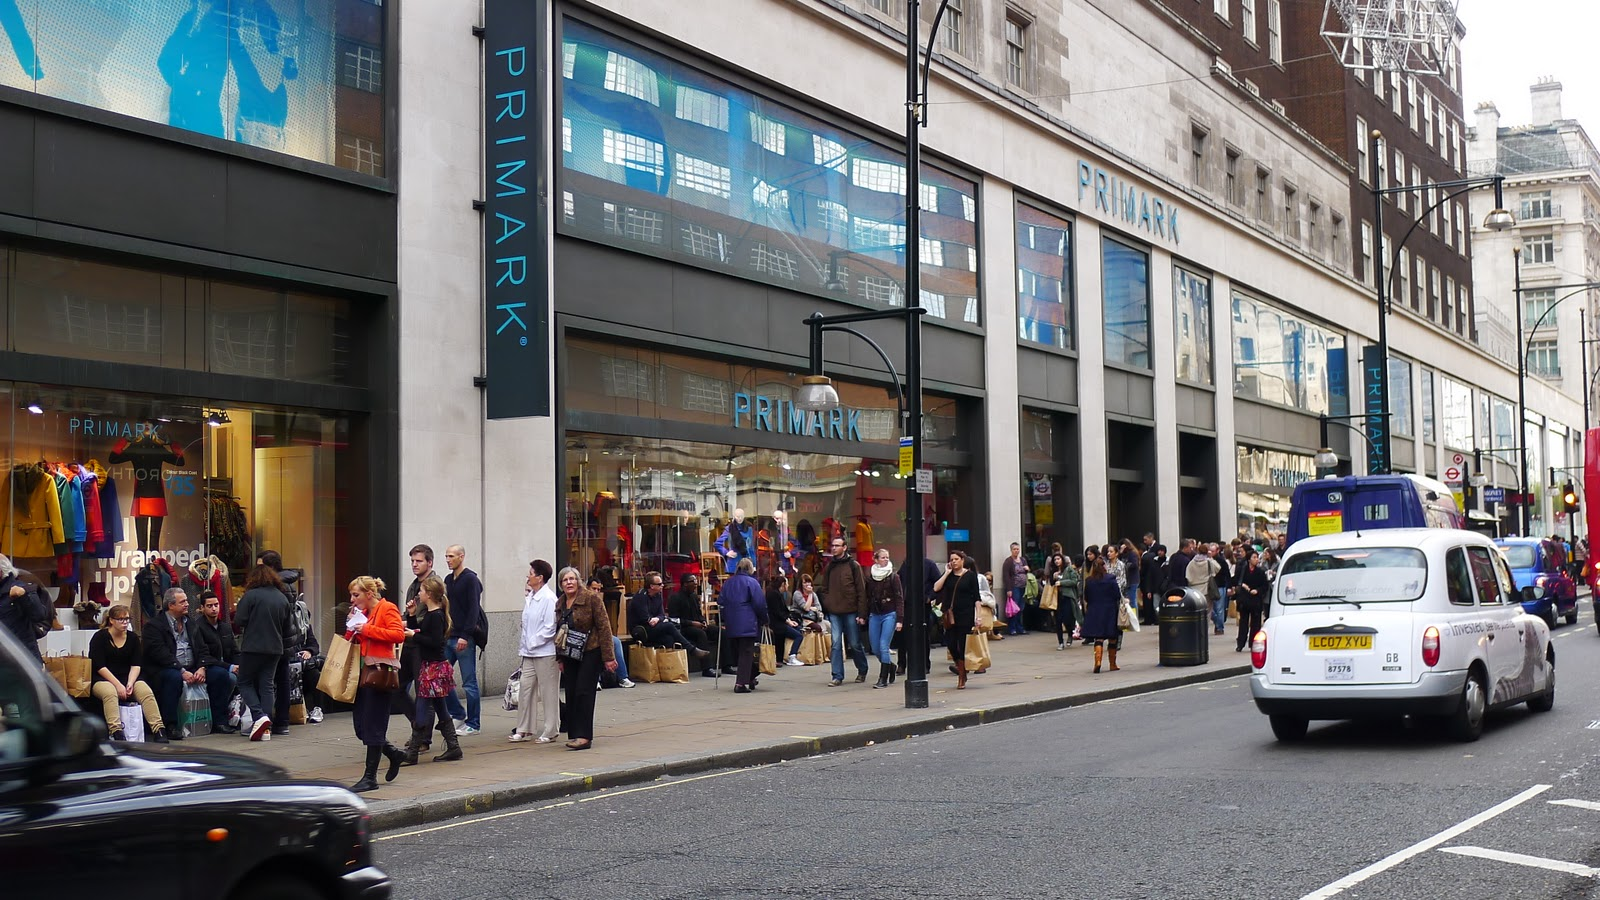 Primark clothing store